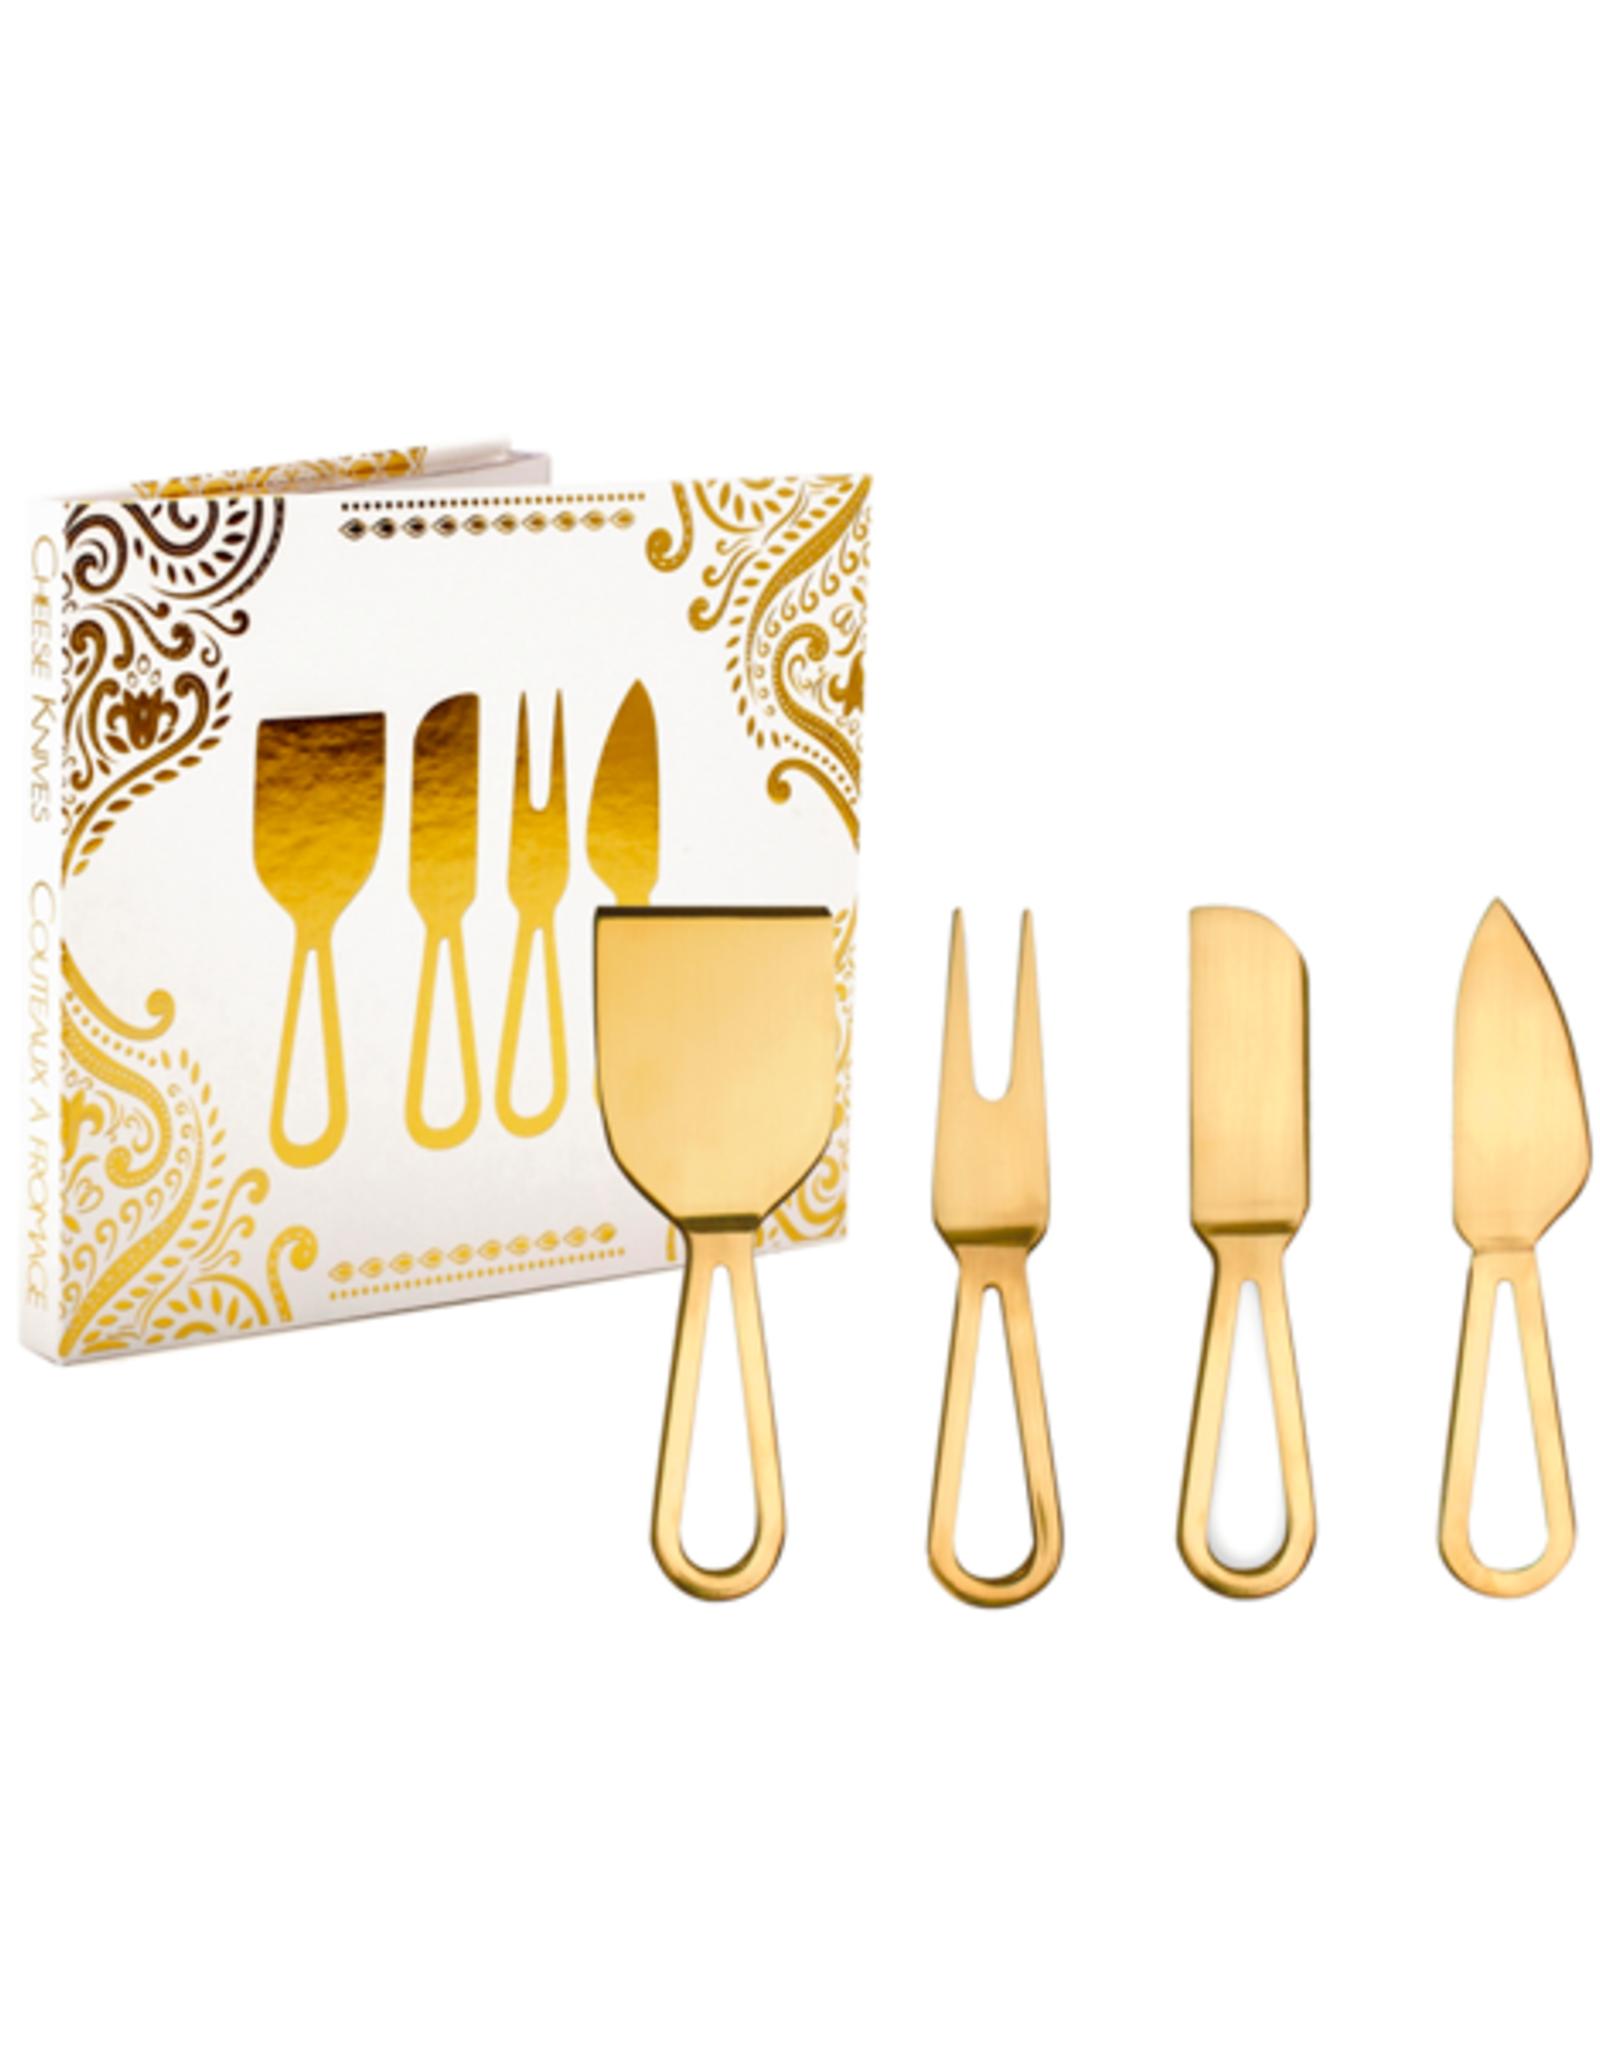 DCO - Cheese Knives/Set 4, Gold